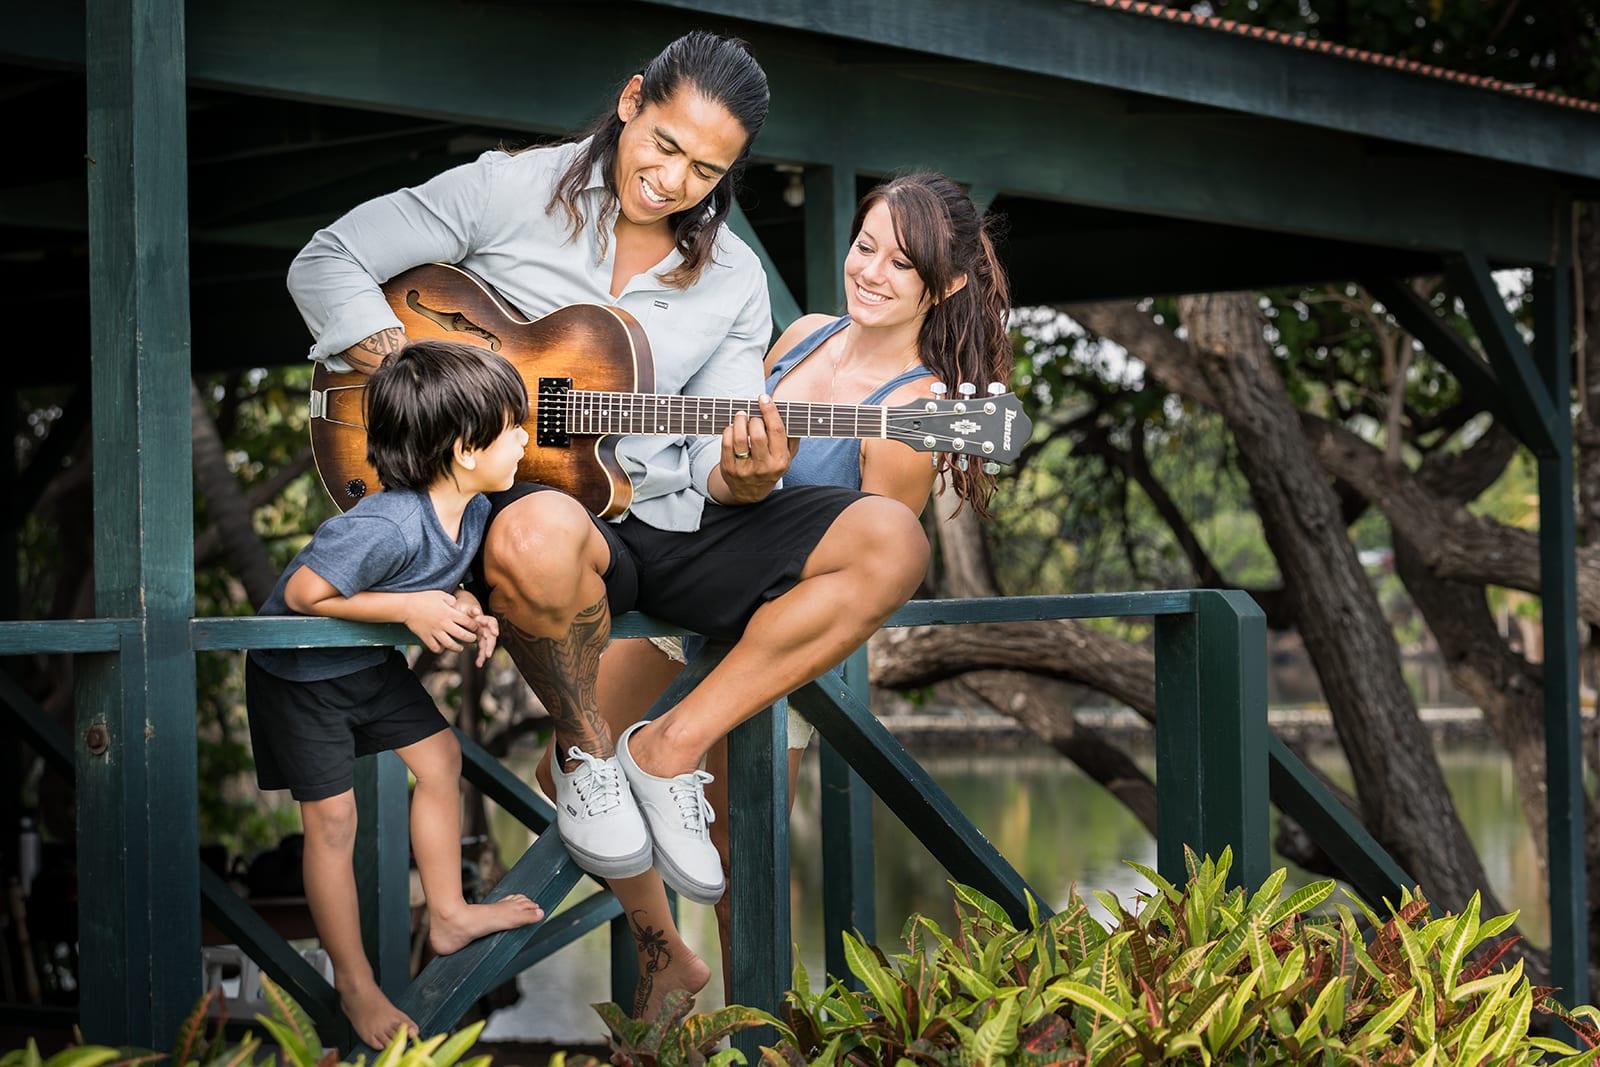 Big-Island-Musician-Band-Photographer-Artist-Portrait-Hawaii-6.jpg